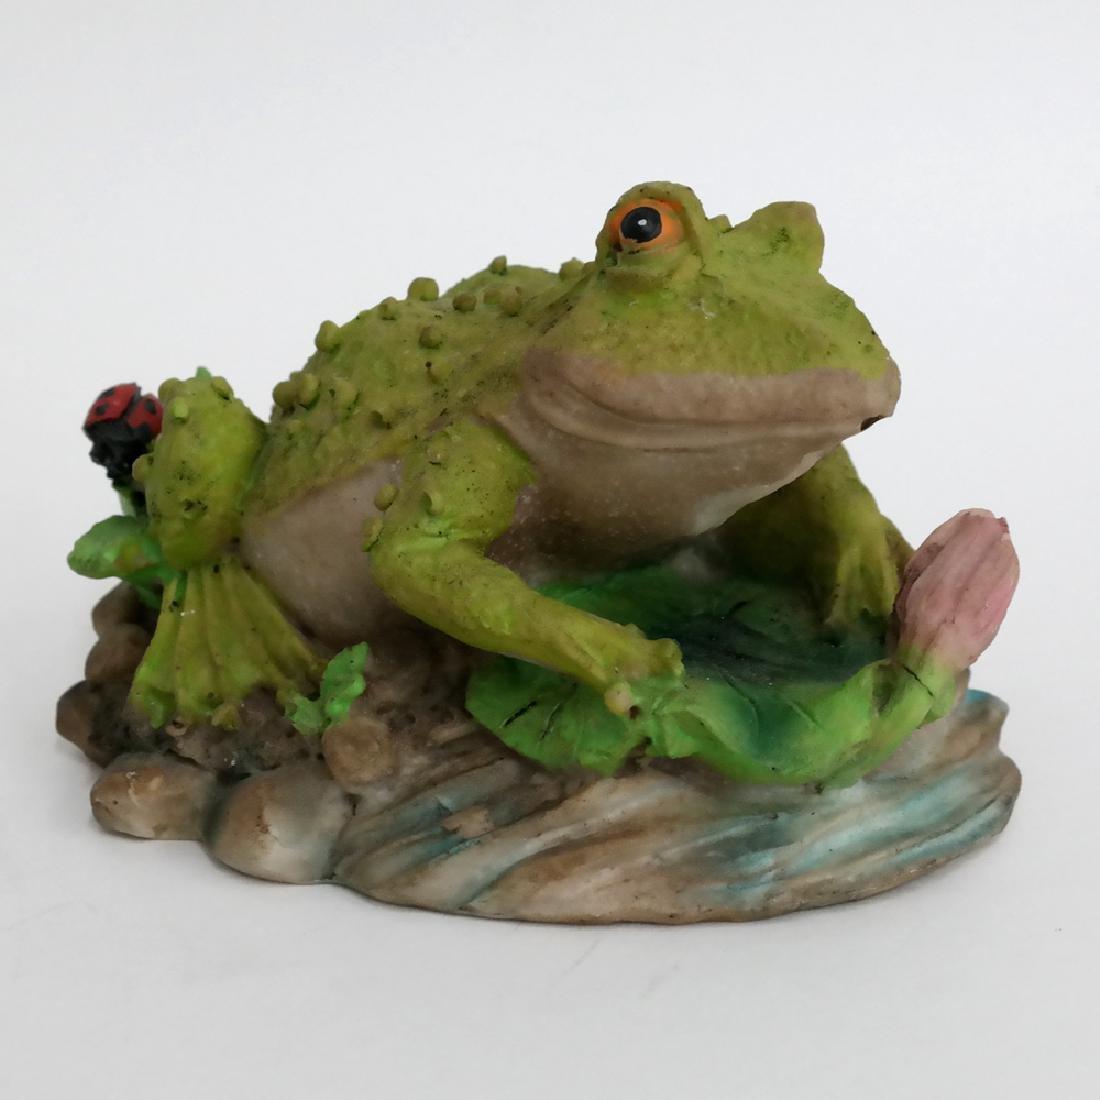 Vintage FROG TOAD WITH LADYBUG statue figurine - 5